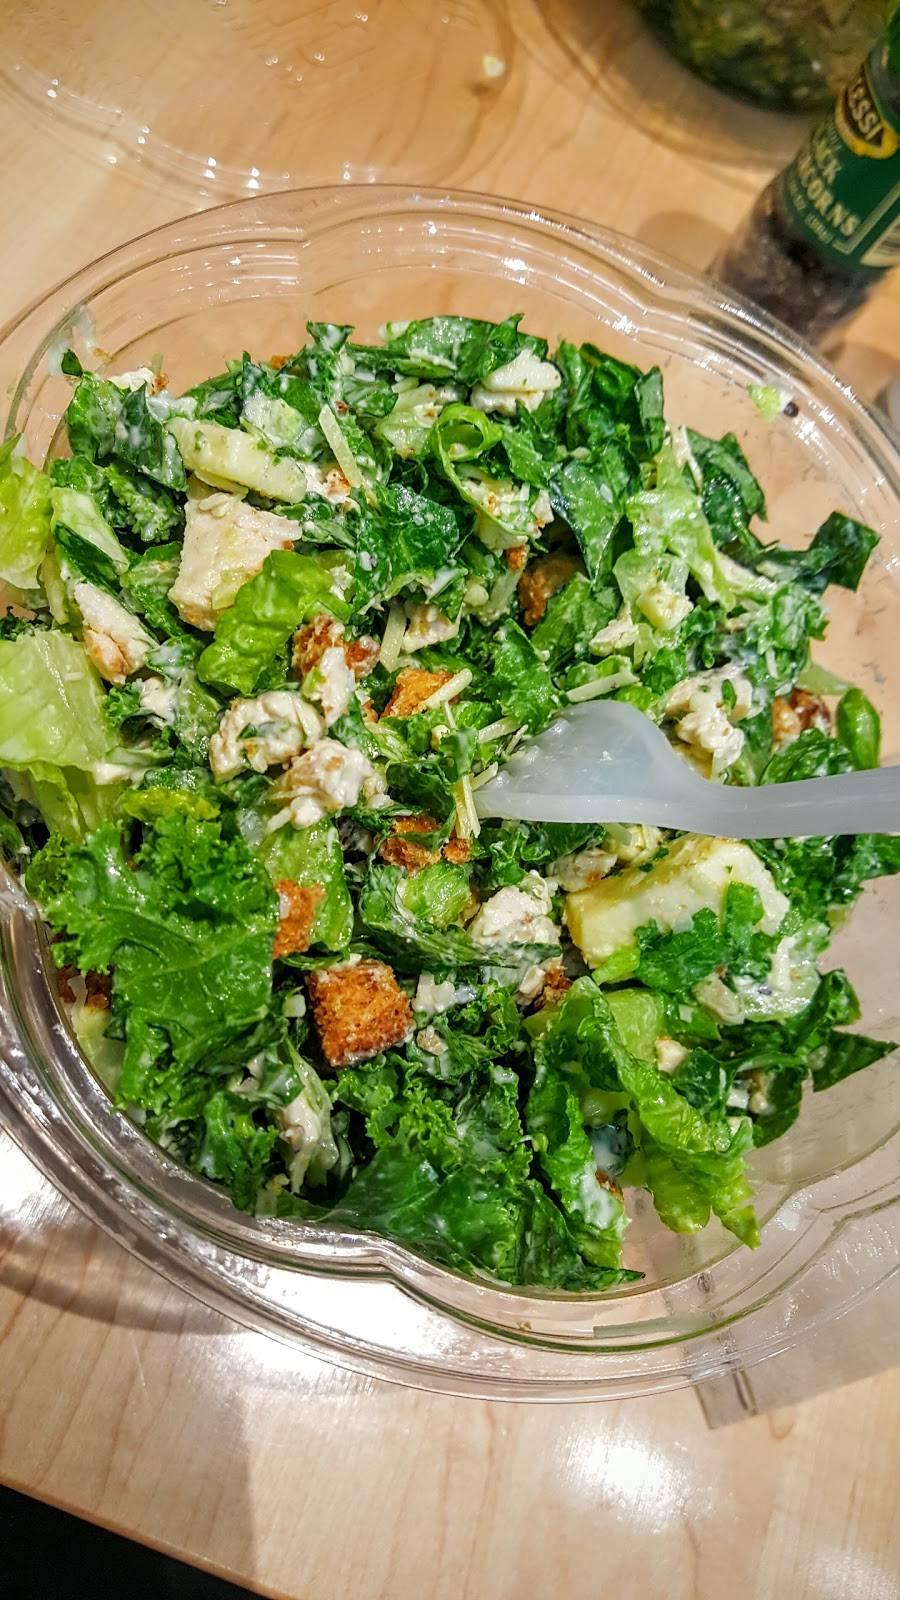 Chopt Creative Salad Co. | restaurant | 24 E 17th St, New York, NY 10003, USA | 6463365523 OR +1 646-336-5523